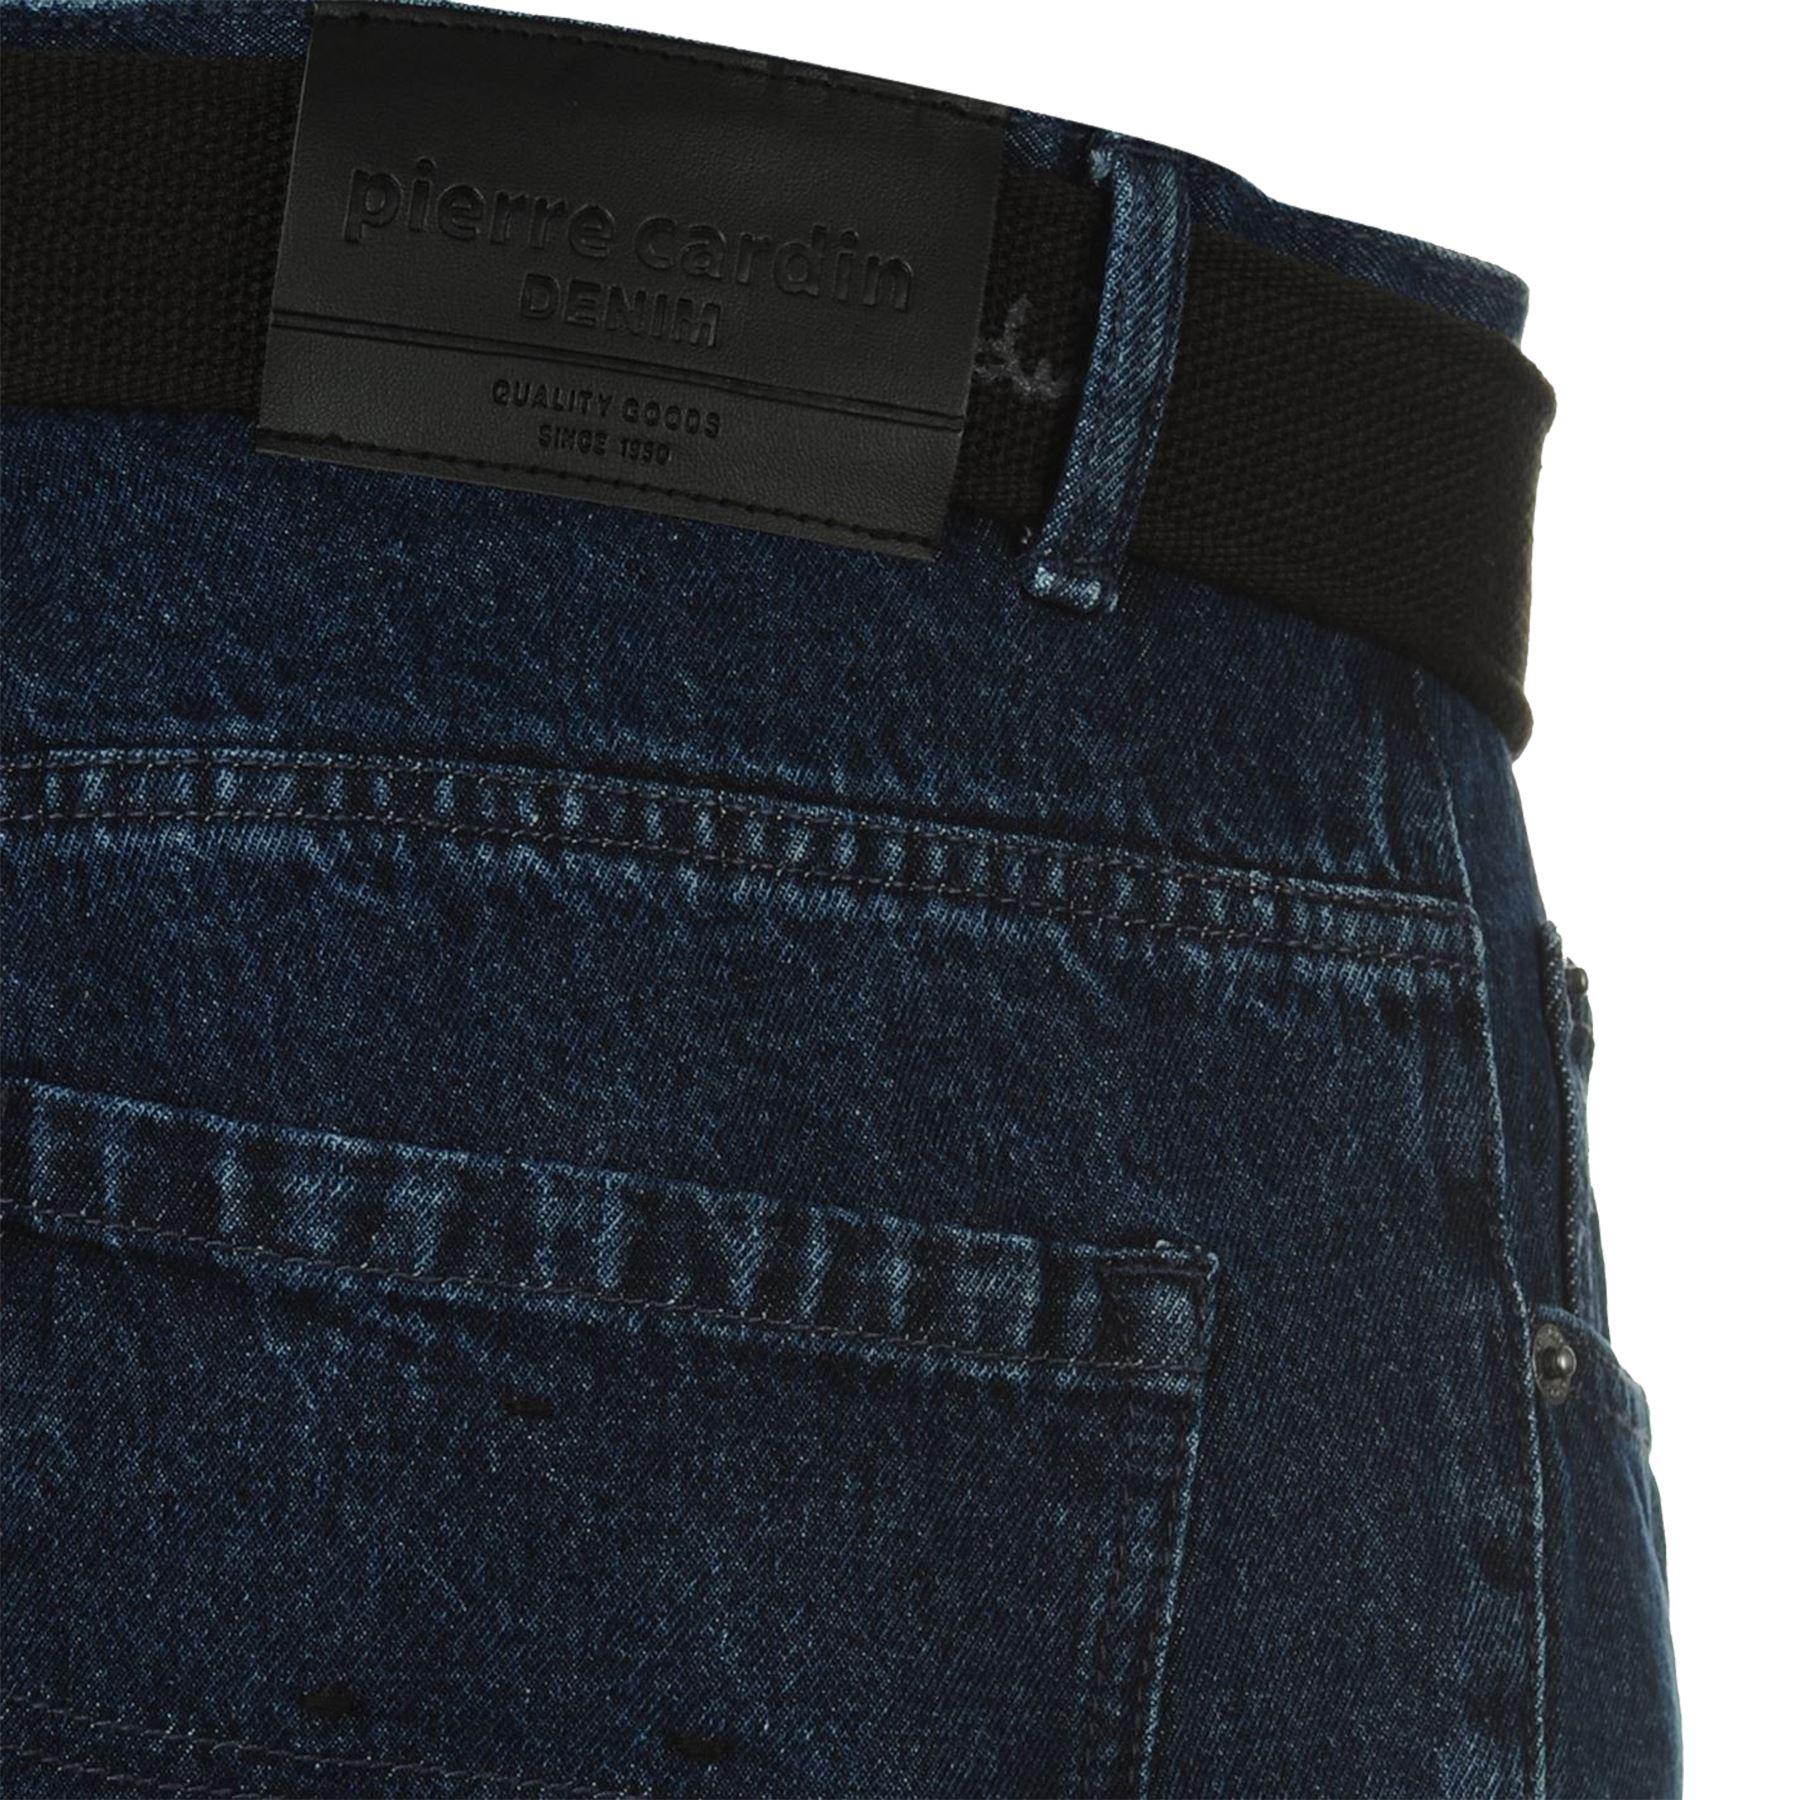 Mens-Belted-Denim-Jeans-Straight-Leg-Regular-Fit-Pierre-Cardin-Pants-Big-Tall thumbnail 17